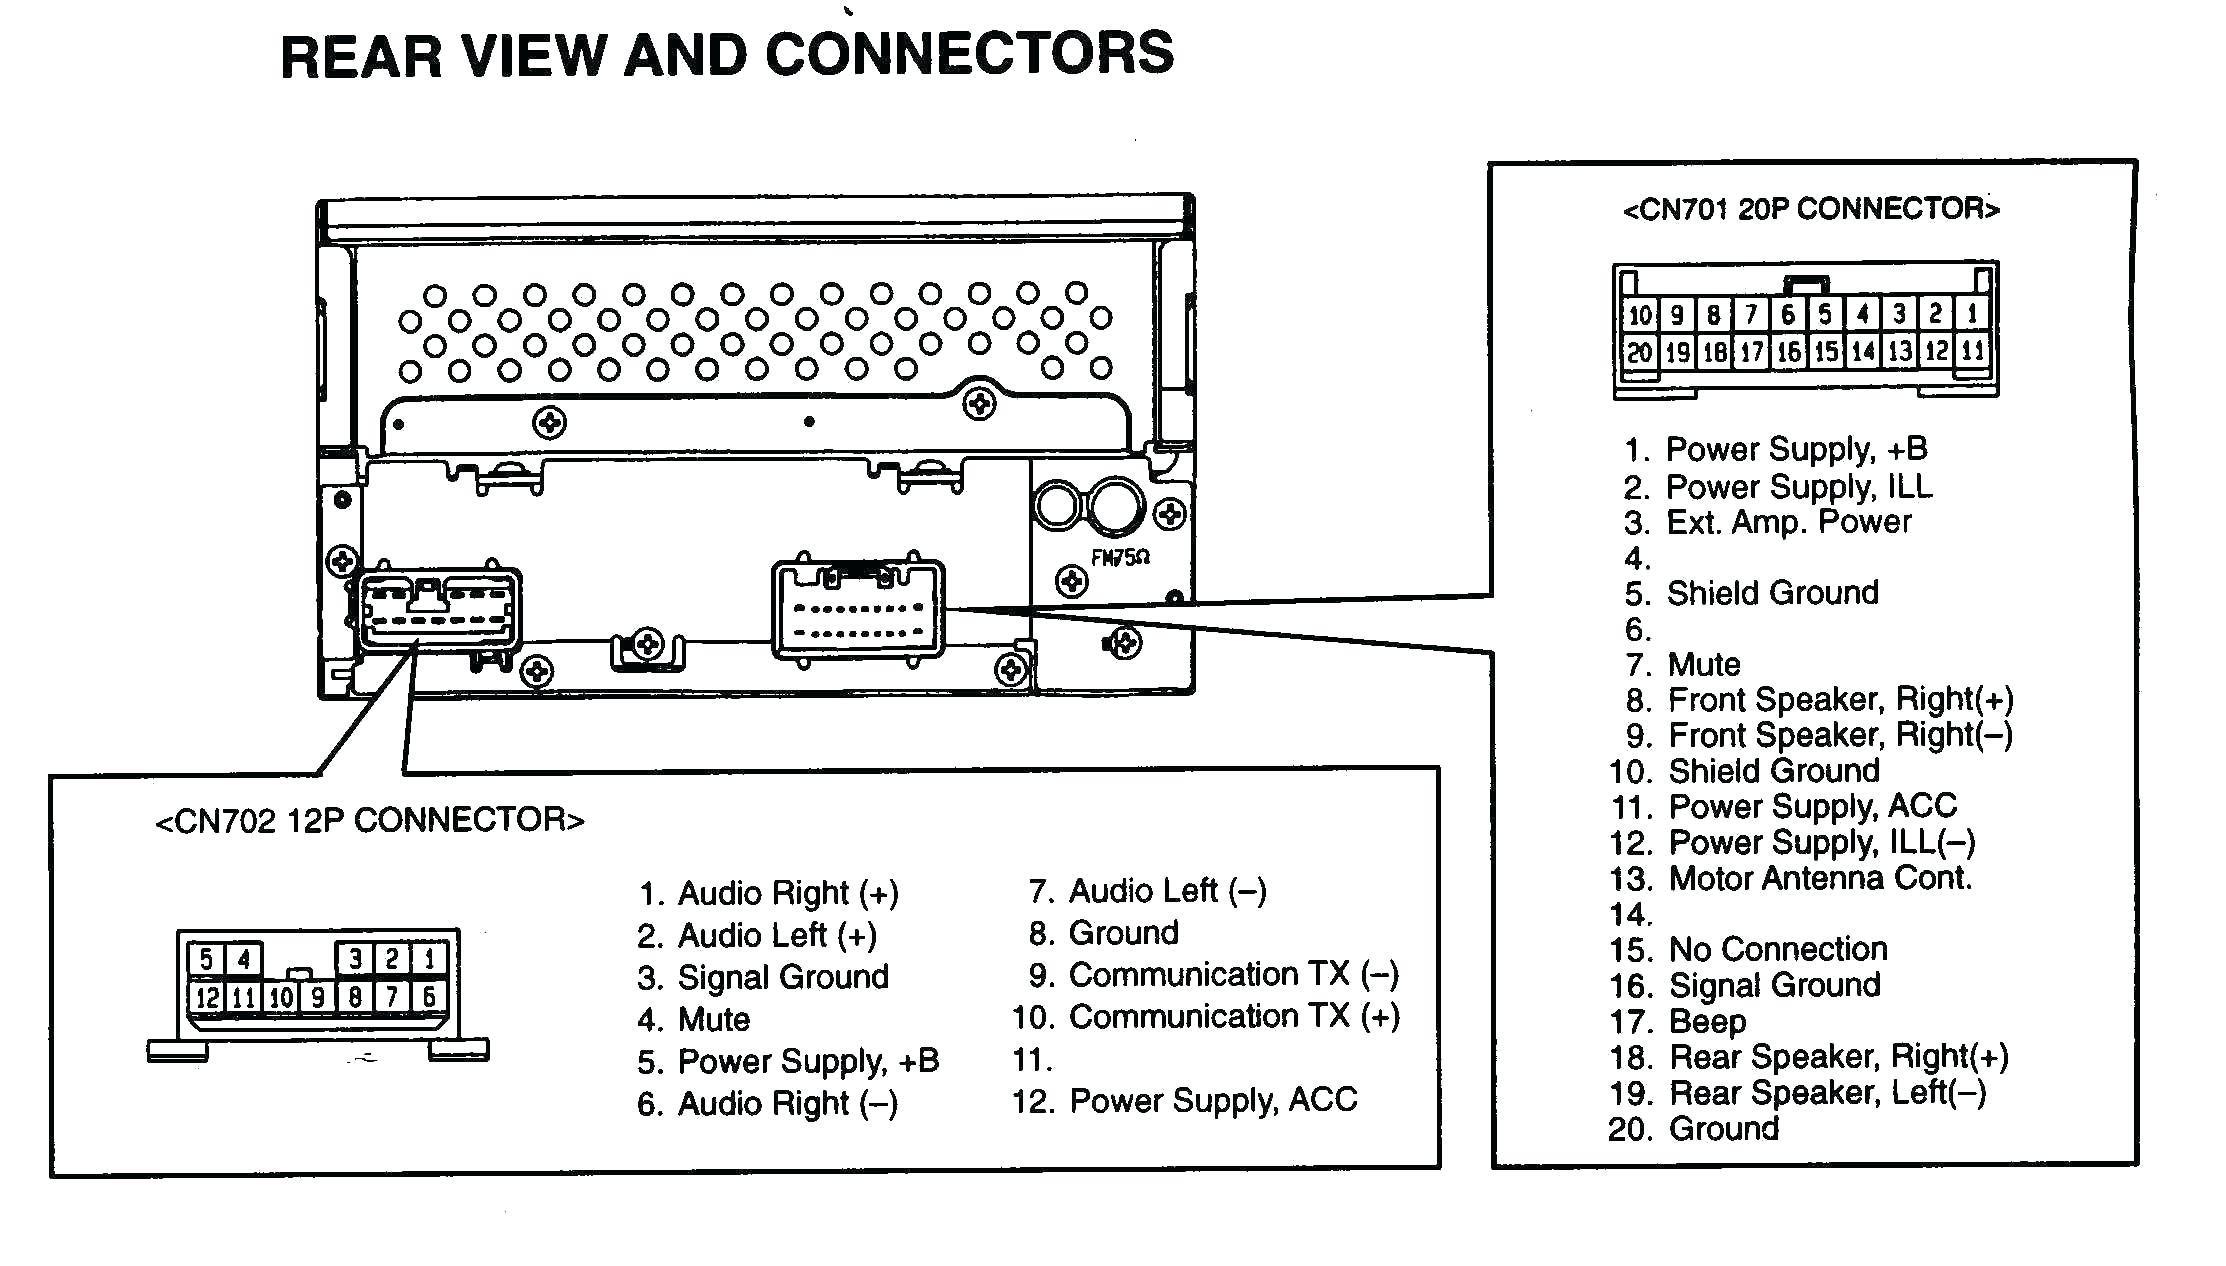 Rj11 Wiring Diagram Using Cat5 Unique Telephone Wiring Diagram Extension Australia Knob and Tube Old